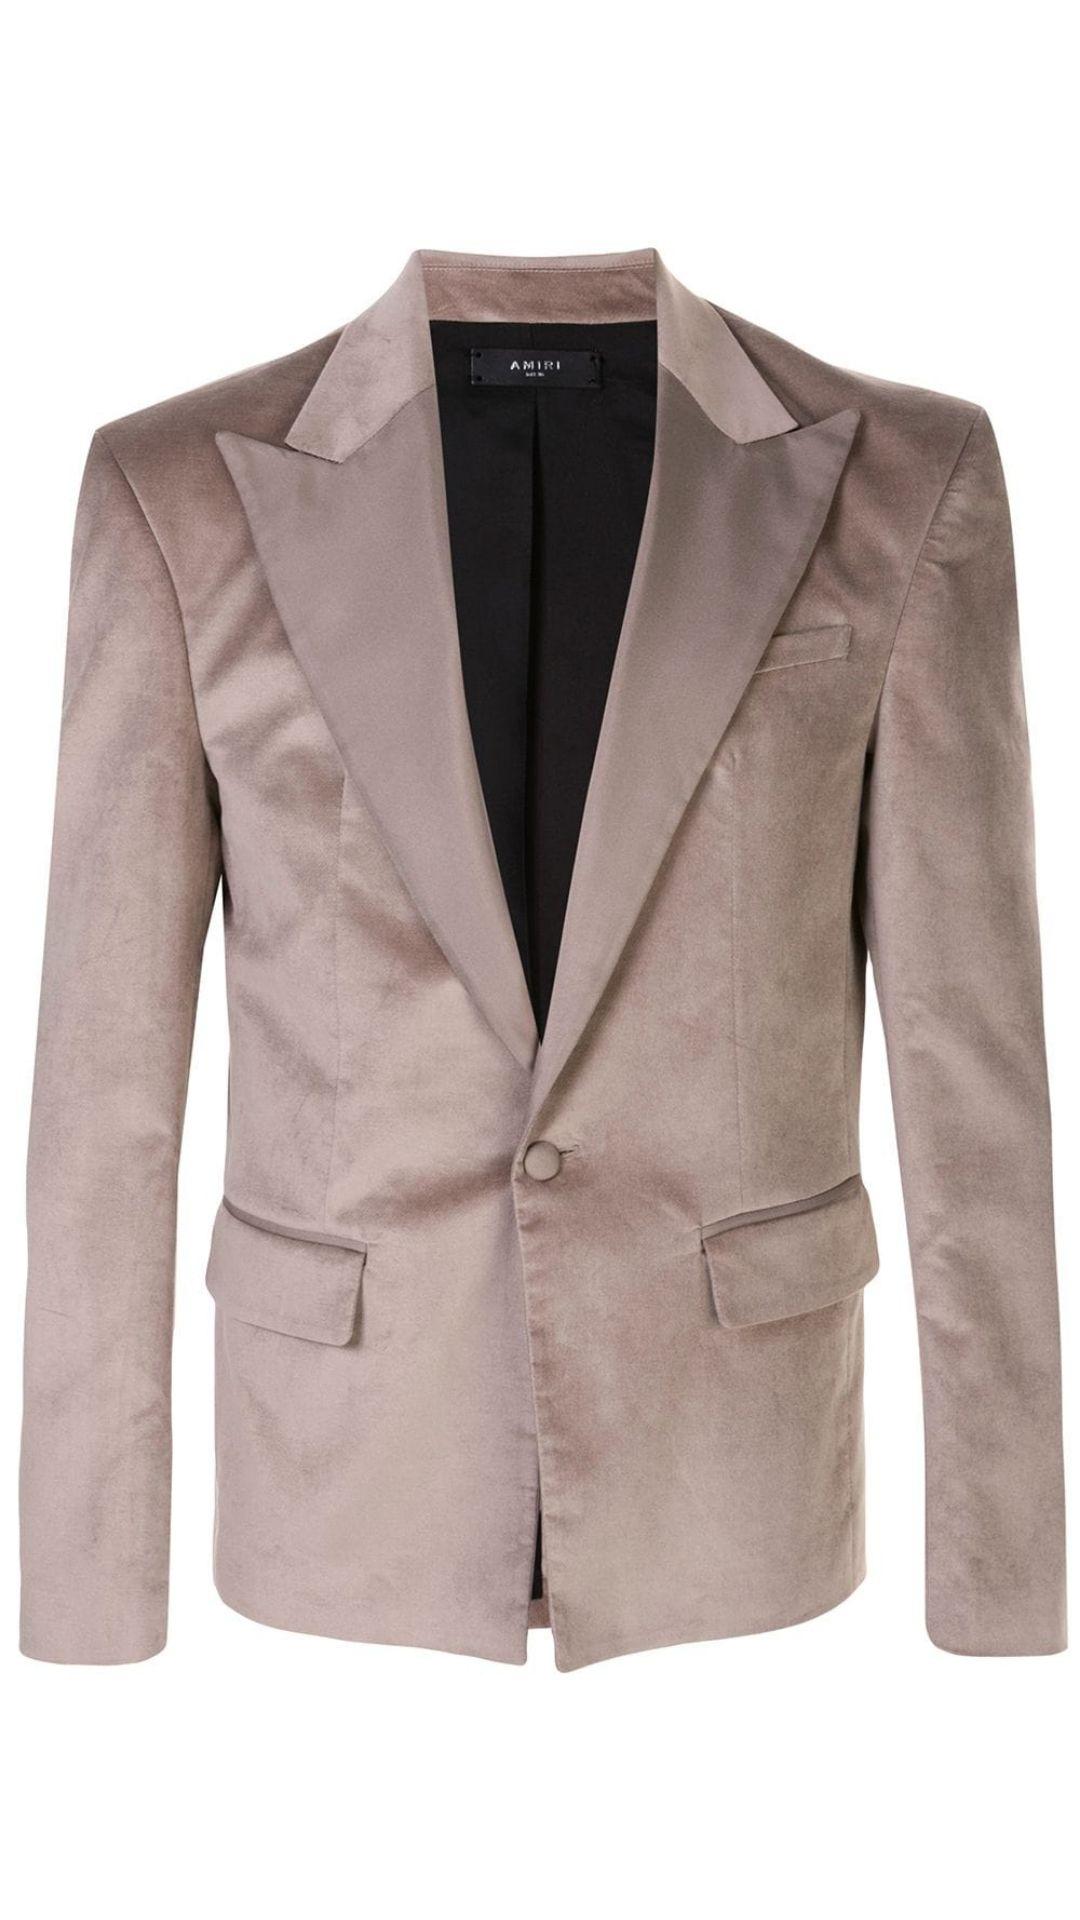 fashion, menswear, style, 70s, that 70s show, esquire